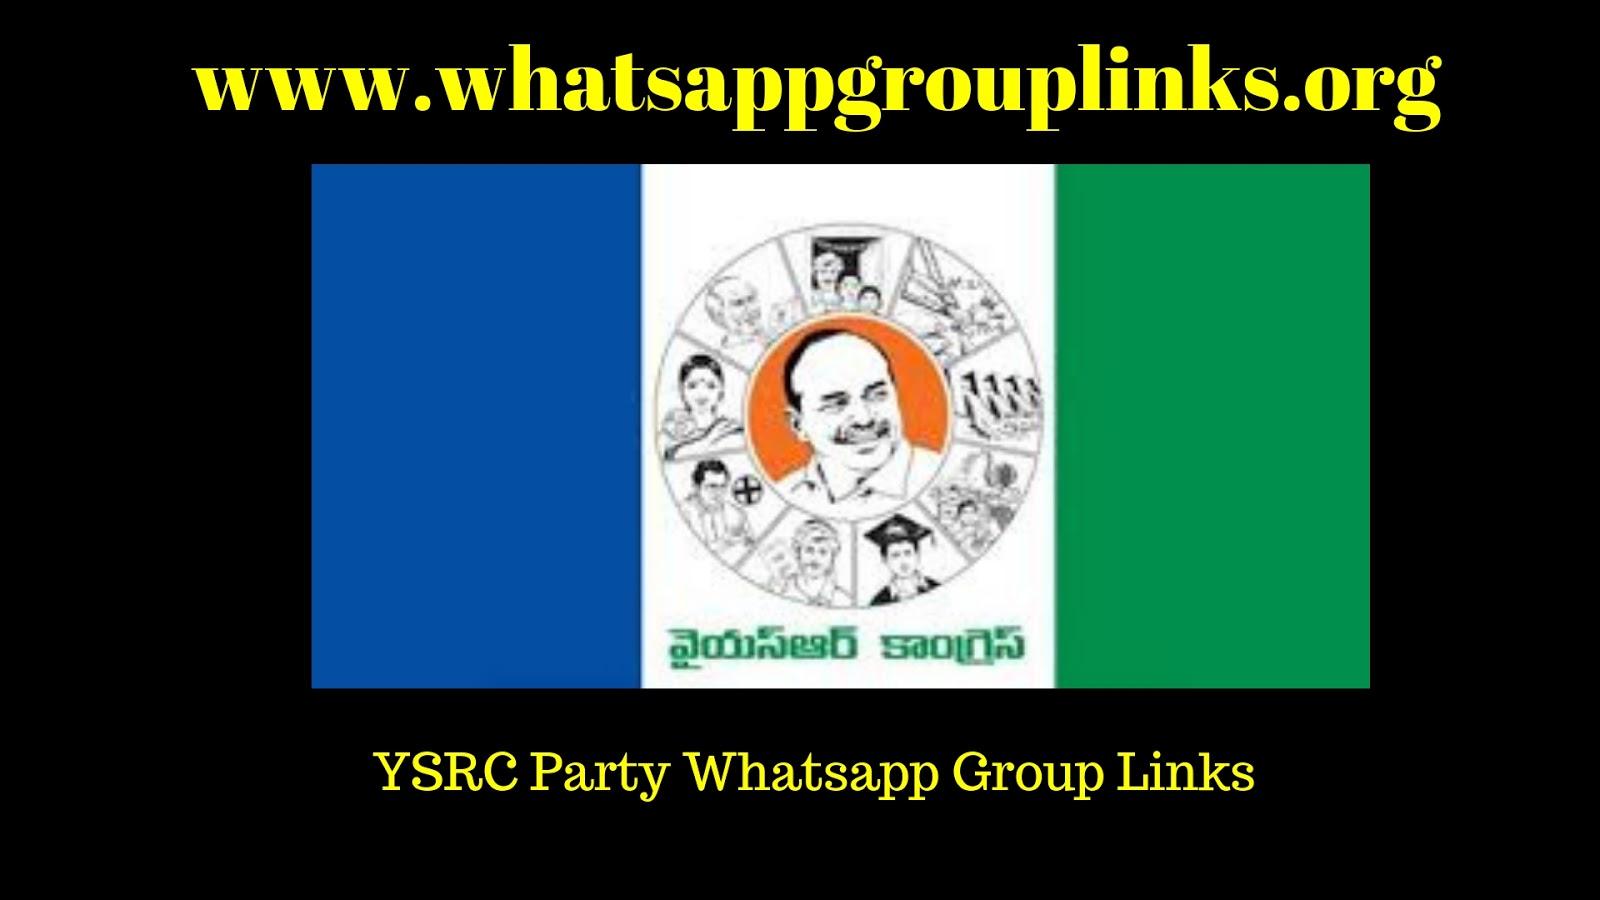 Join YSR Congress Party Whatsapp Group Links List - Whatsapp Group Links